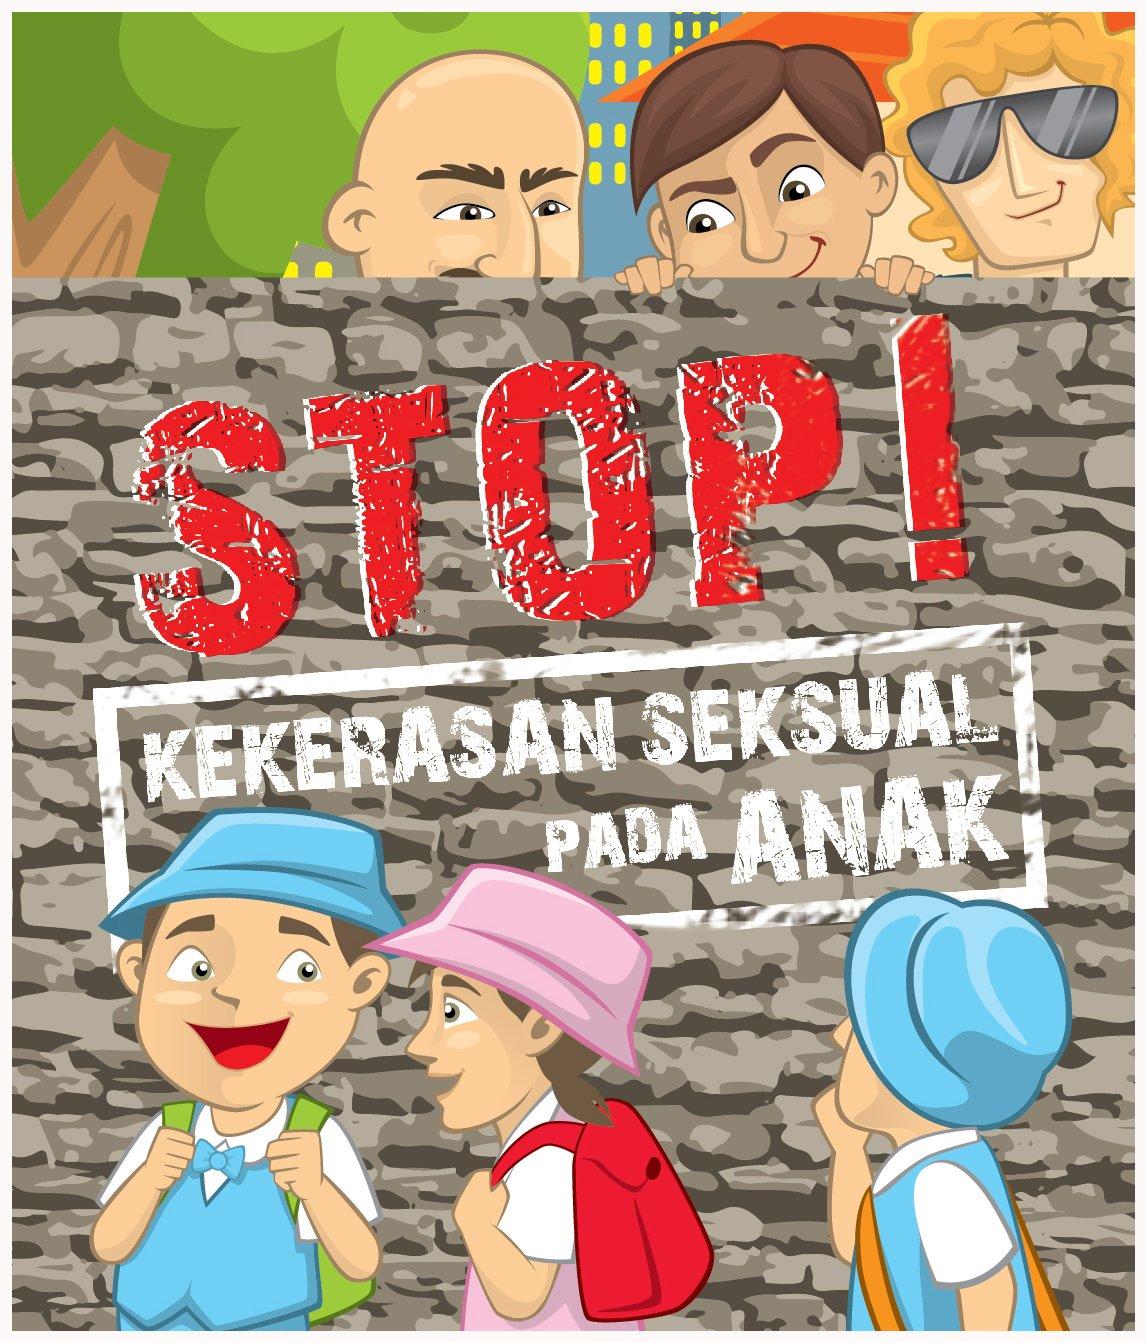 Terkait Peringkat Pelecehan Seksual pada Anak, Imran Khaitami: Sudahi Program Pencitraan